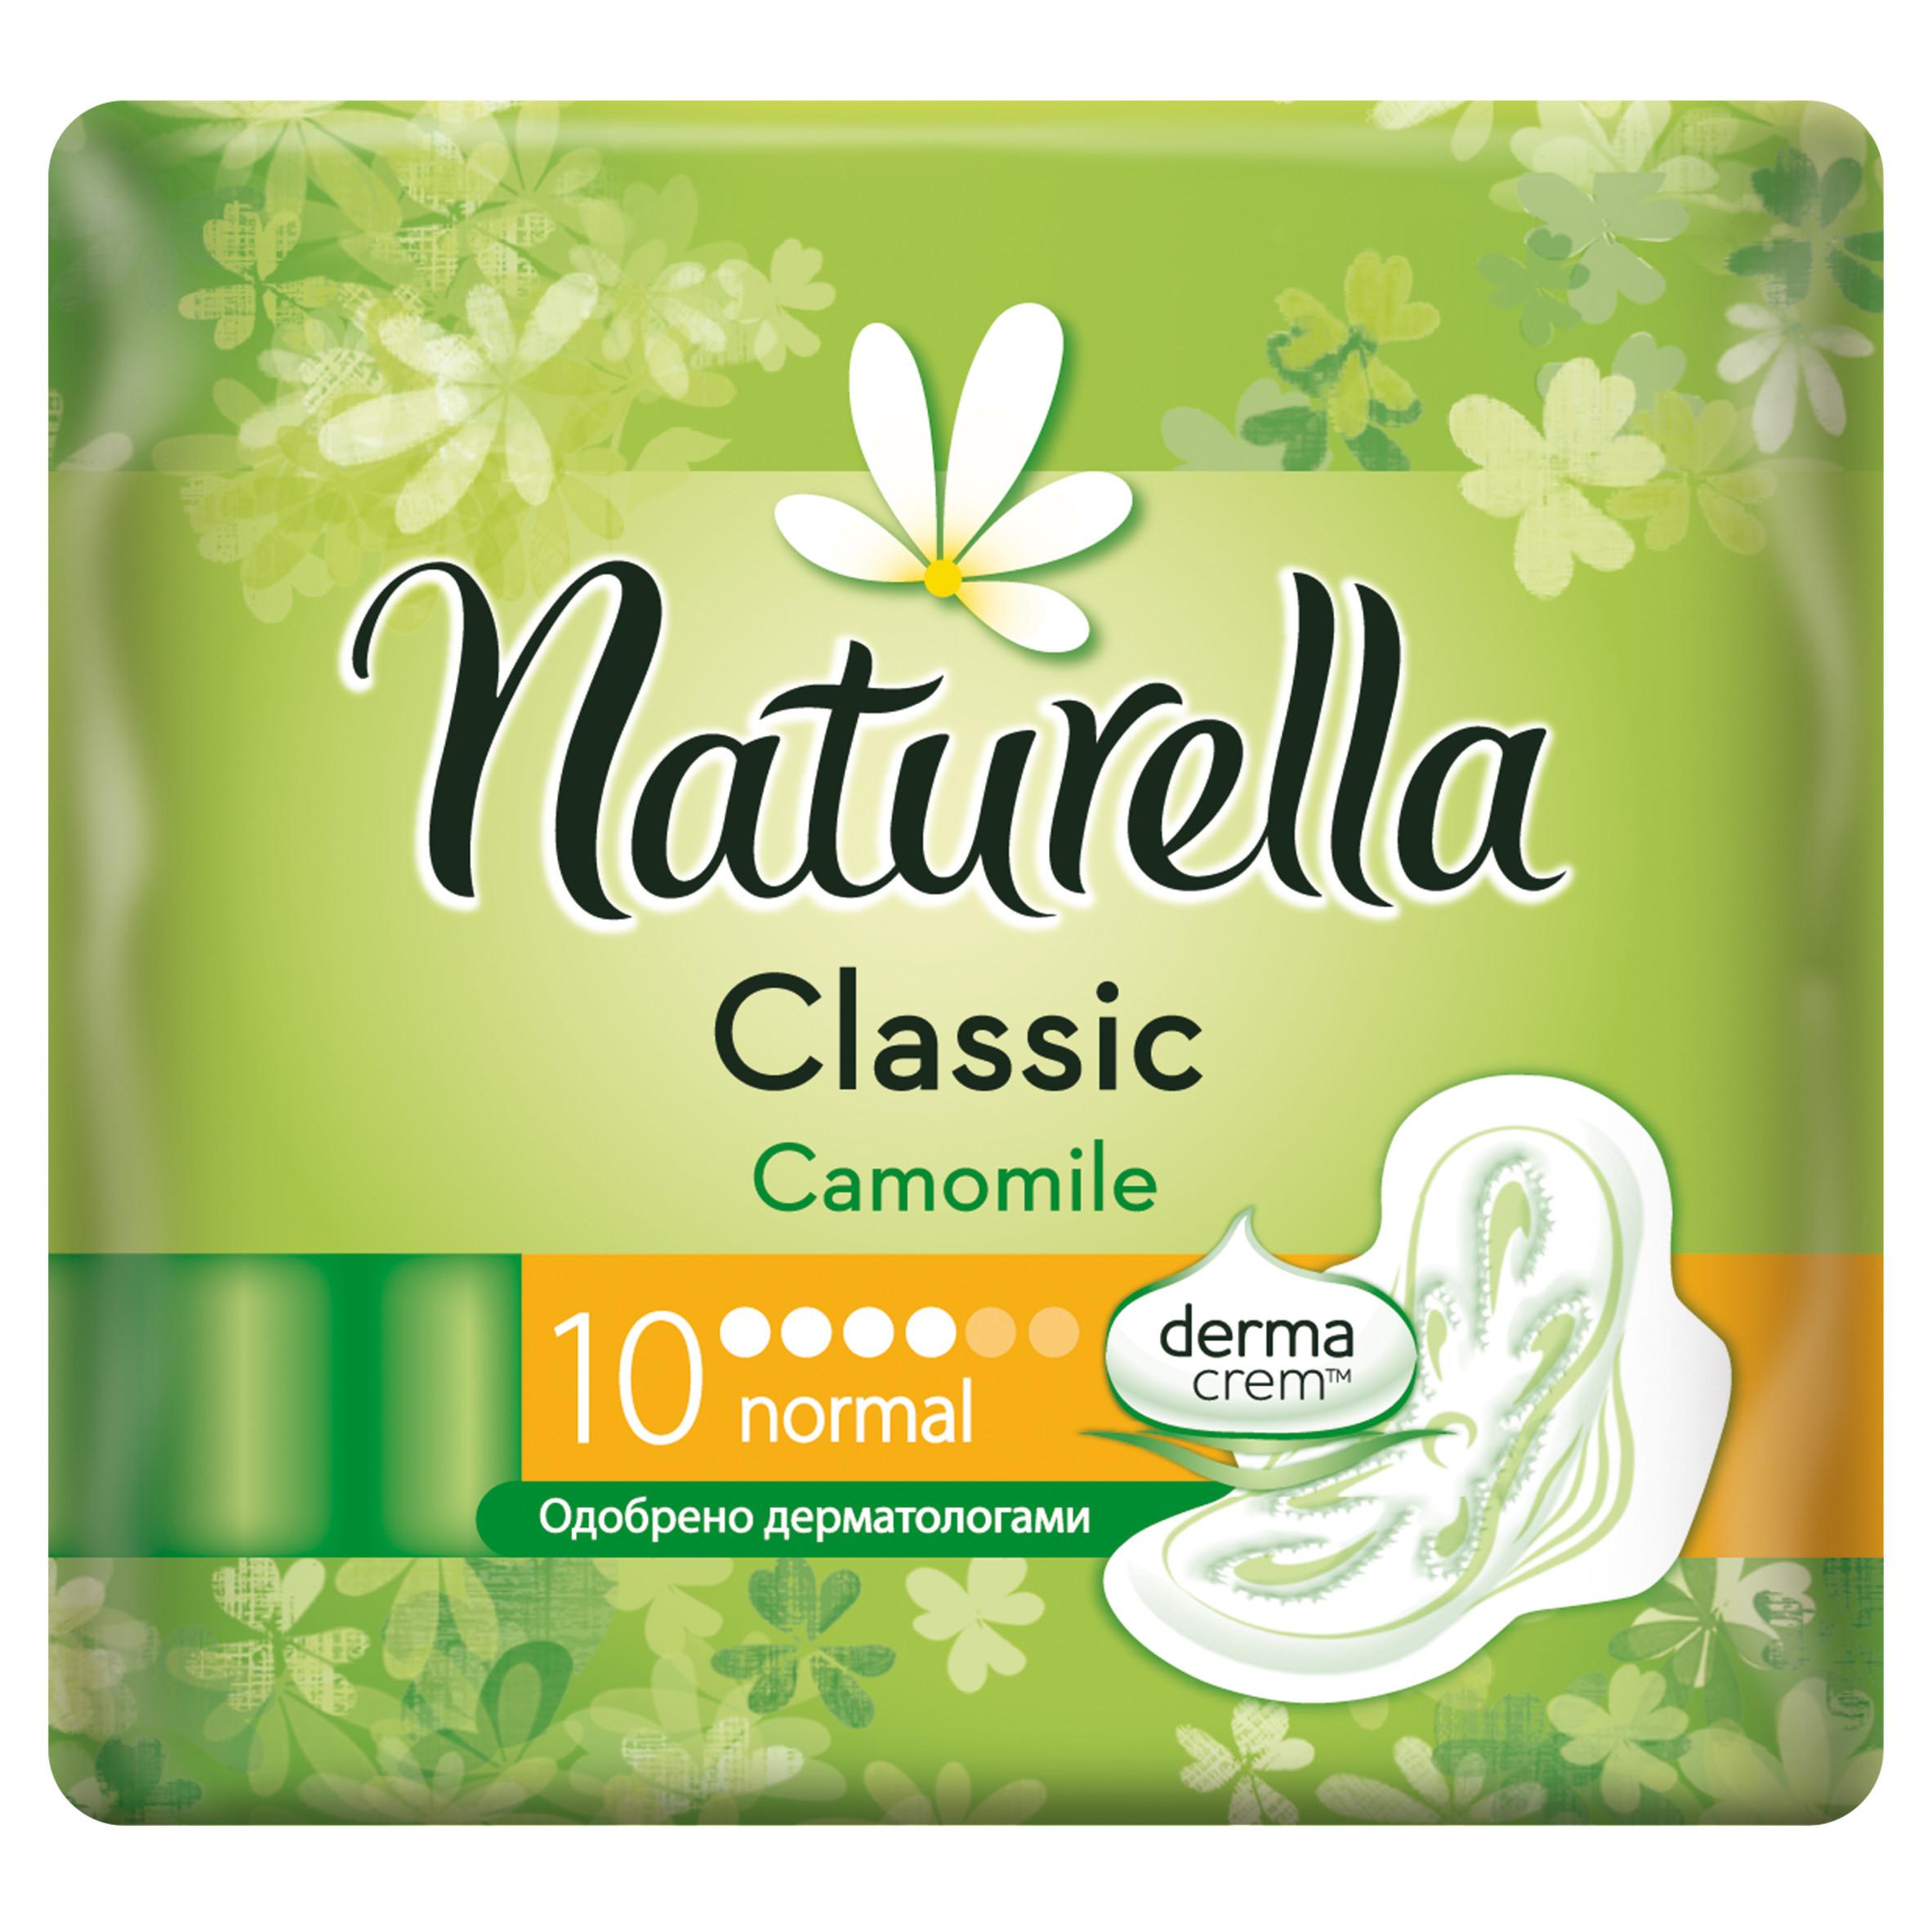 Прокладки гигиенические Naturella Classic Normal Camomile 10Шт.<br>